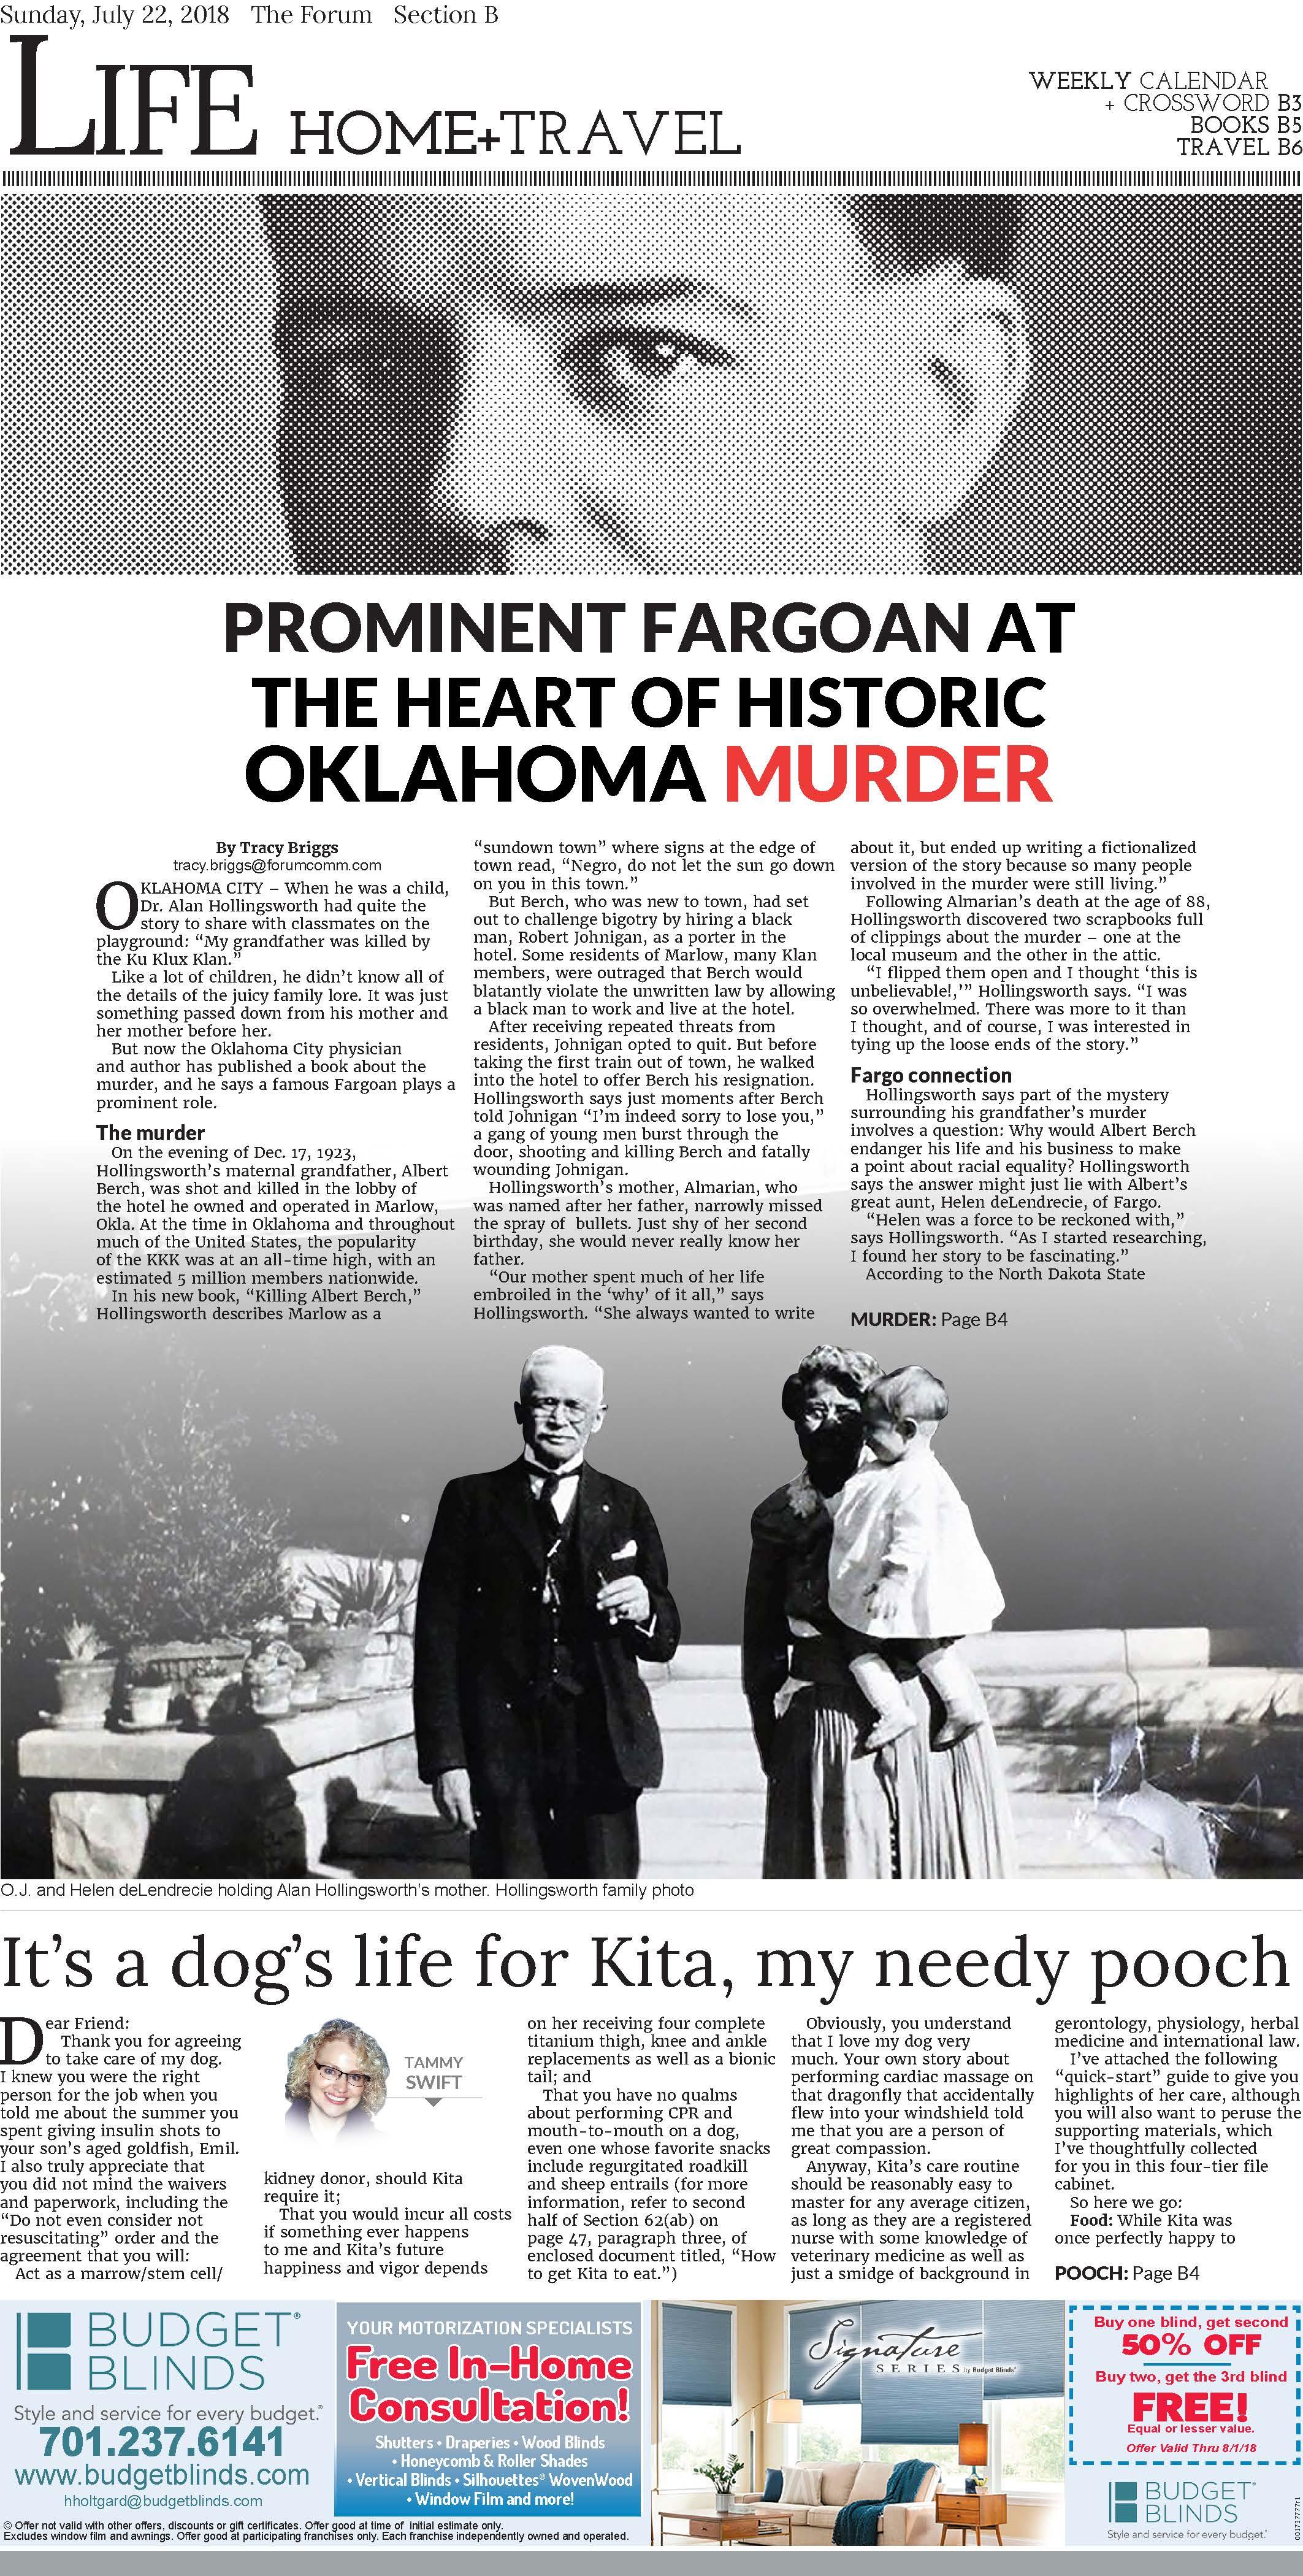 - Variety cover of Fargo - Moorhead's The Forum